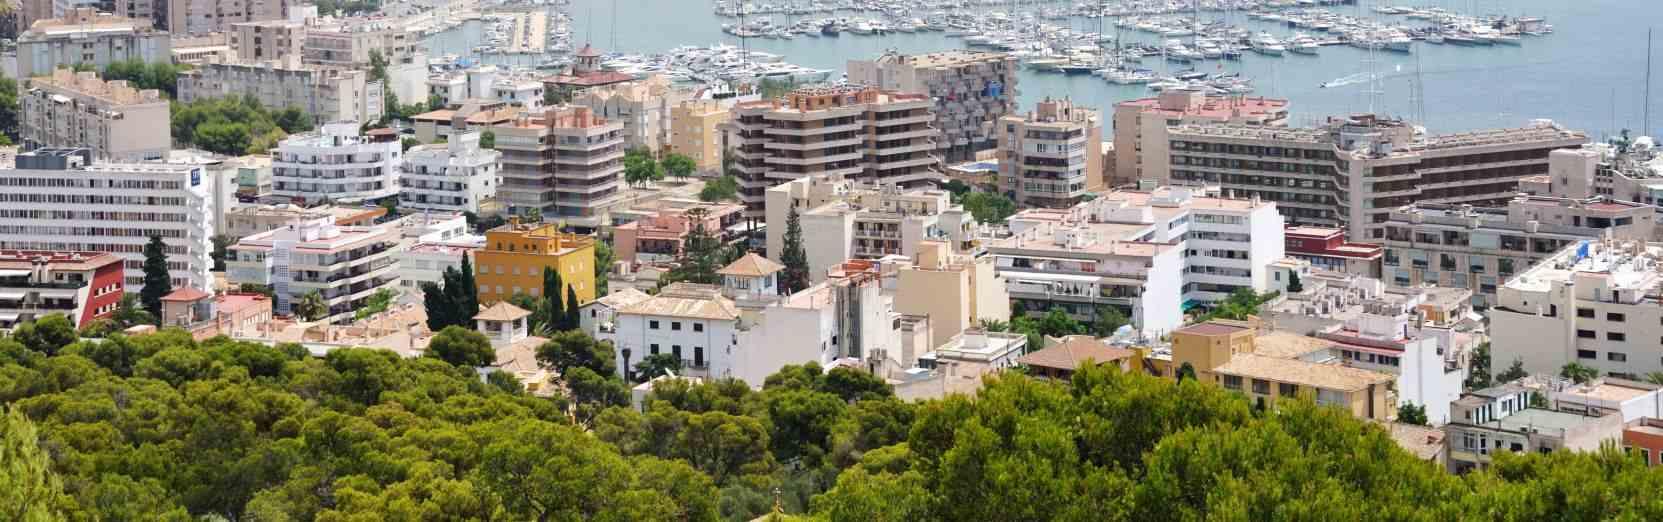 Mallorca Mietwagen ohne Kreditkarte